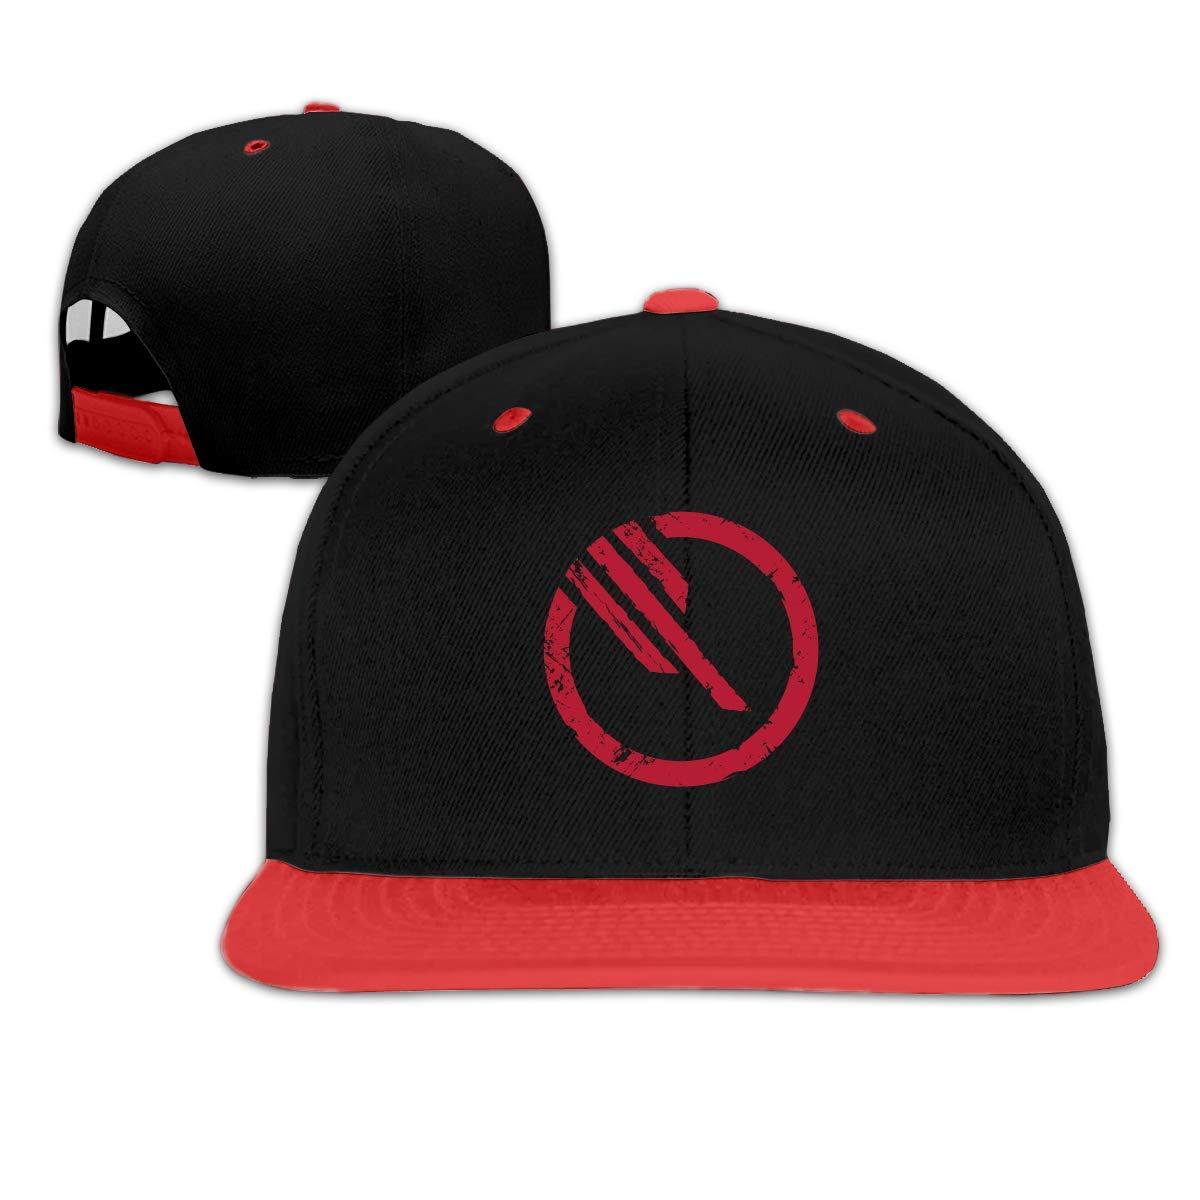 vhfnjs Inferno Squad Emblem Summer Cool Heat Shield Unisex Hip Hop Baseball Cap